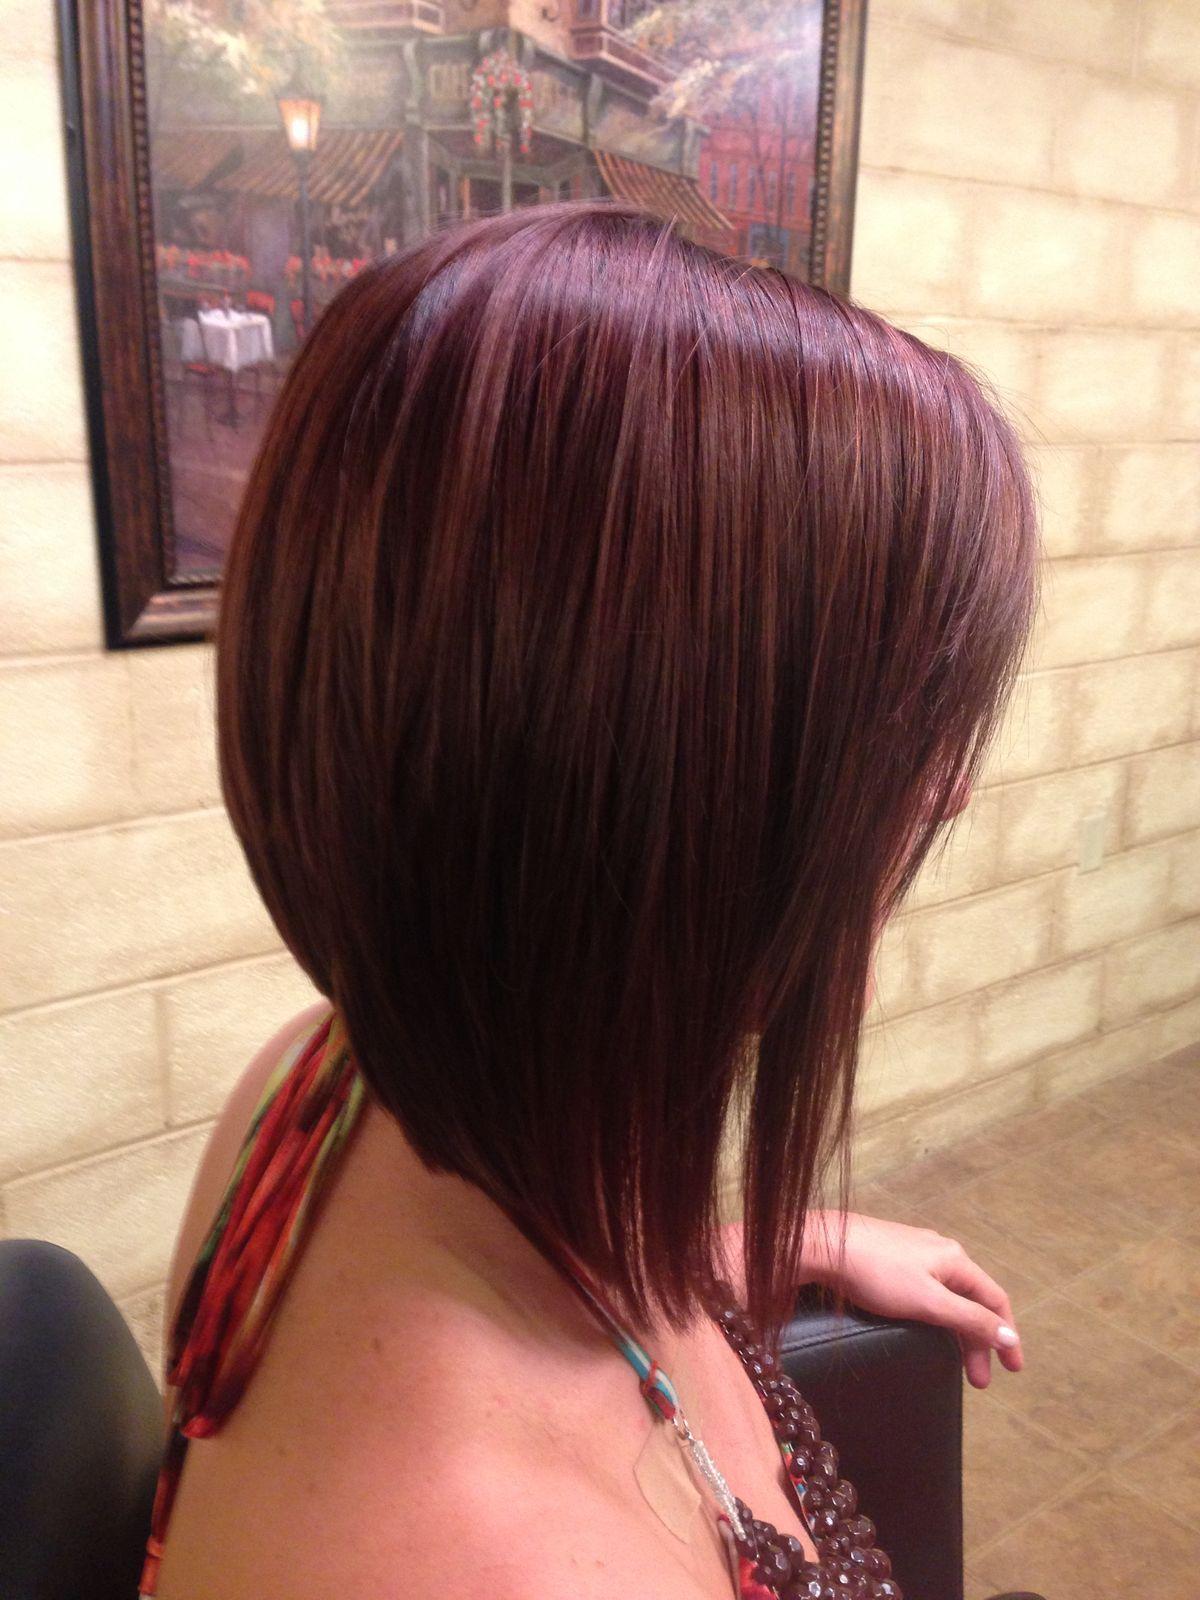 Bbaadafbfbbdfjpg  pixels  hair